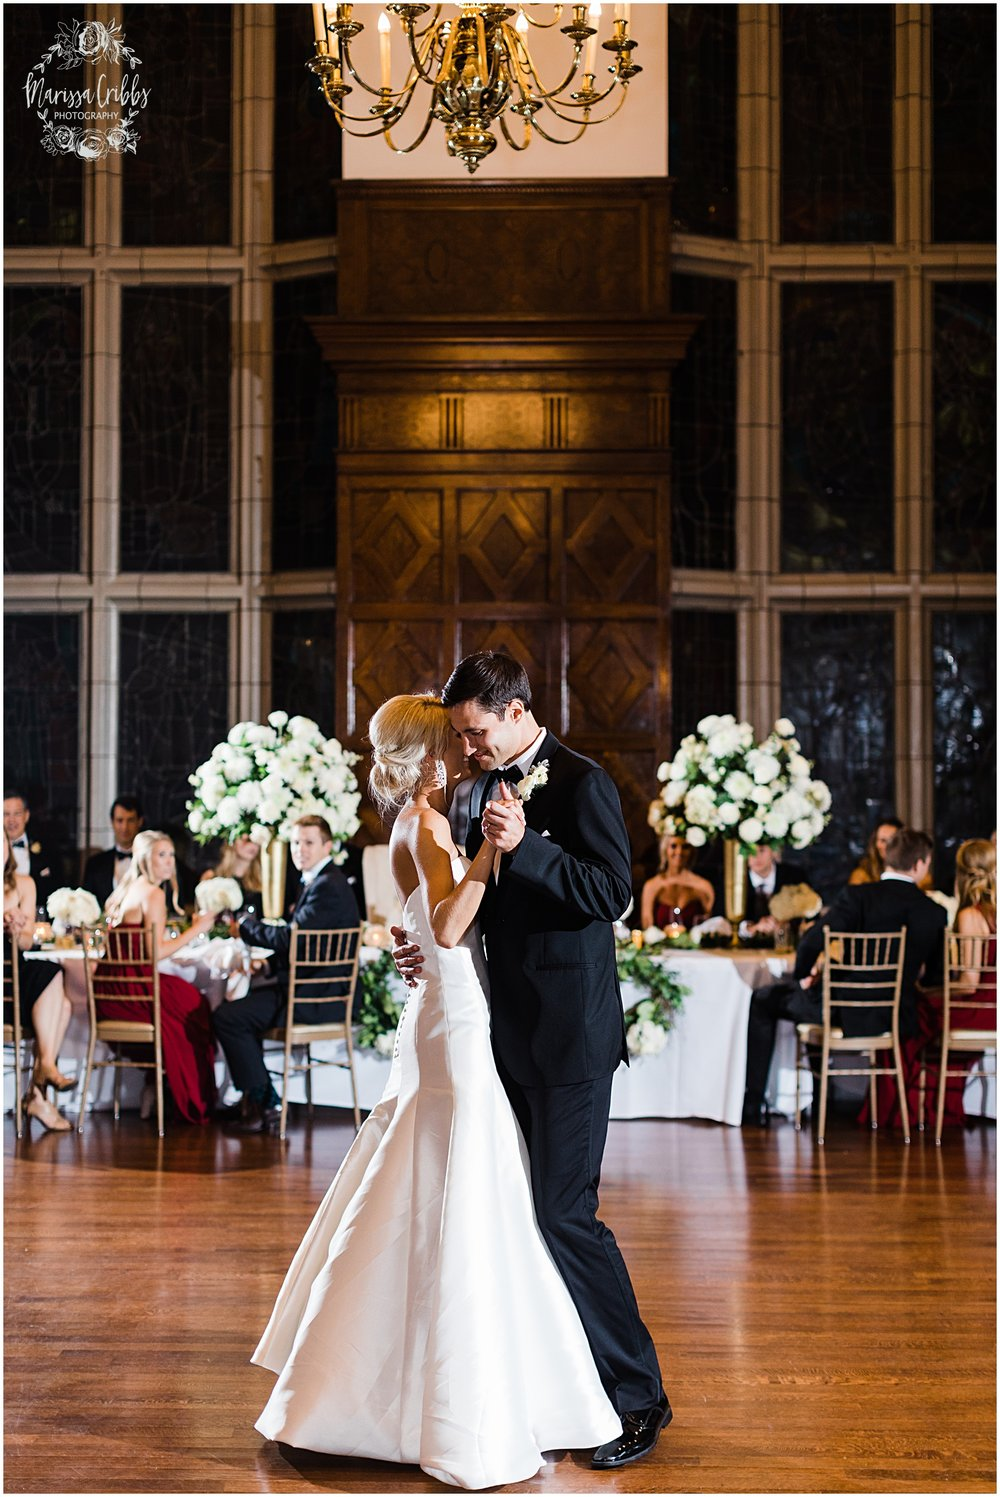 NOLL WEDDING | THE BRASS ON BALTIMORE | MARISSA CRIBBS PHOTOGRAPHY_6375.jpg